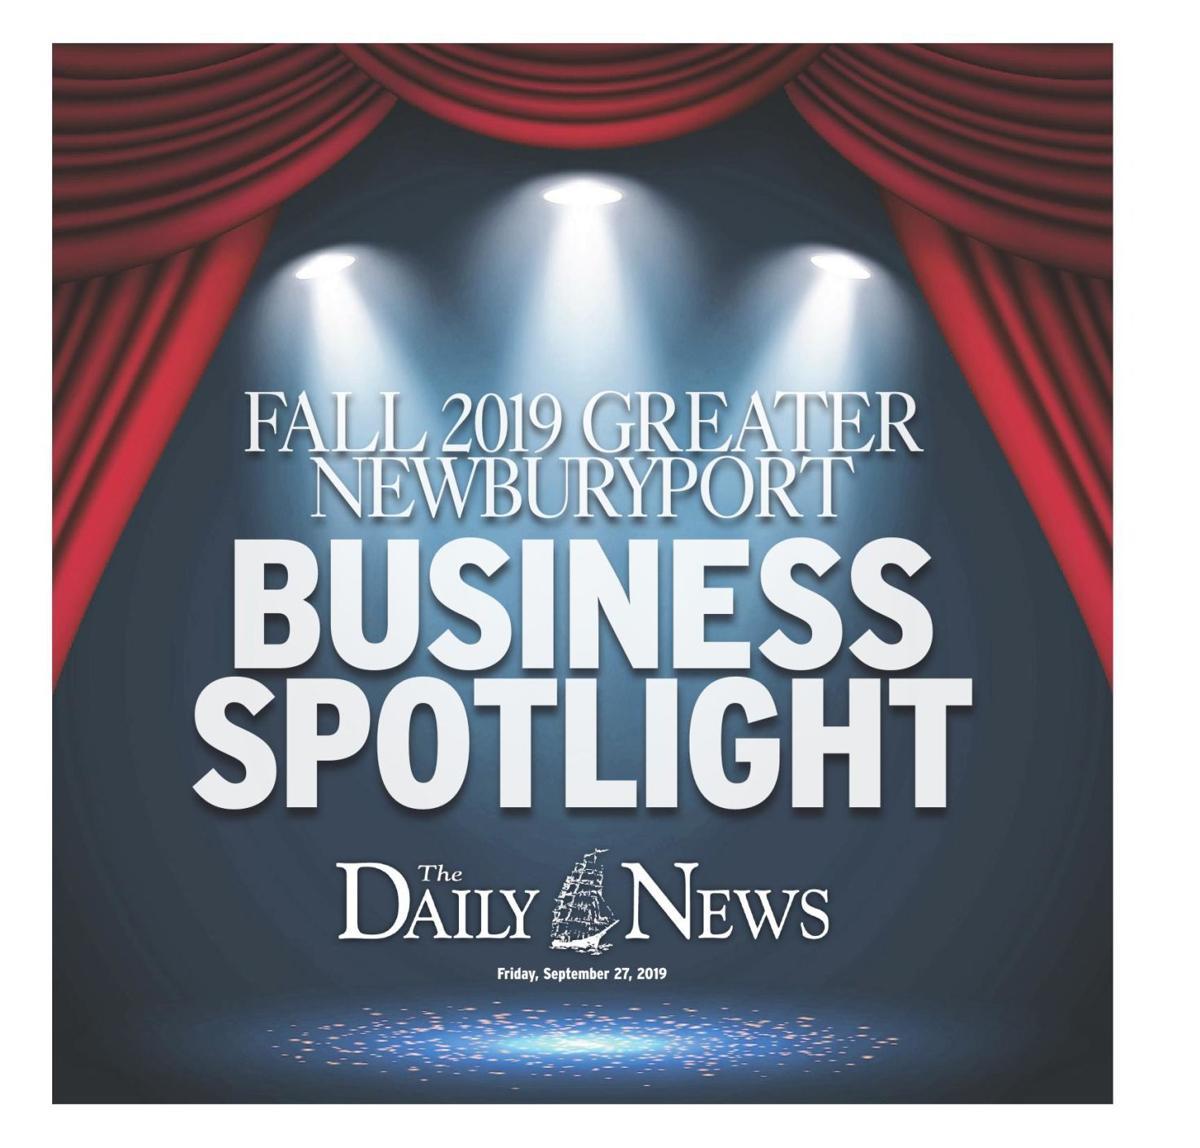 Fall 2019 Greater Newburyport Business Spotlight